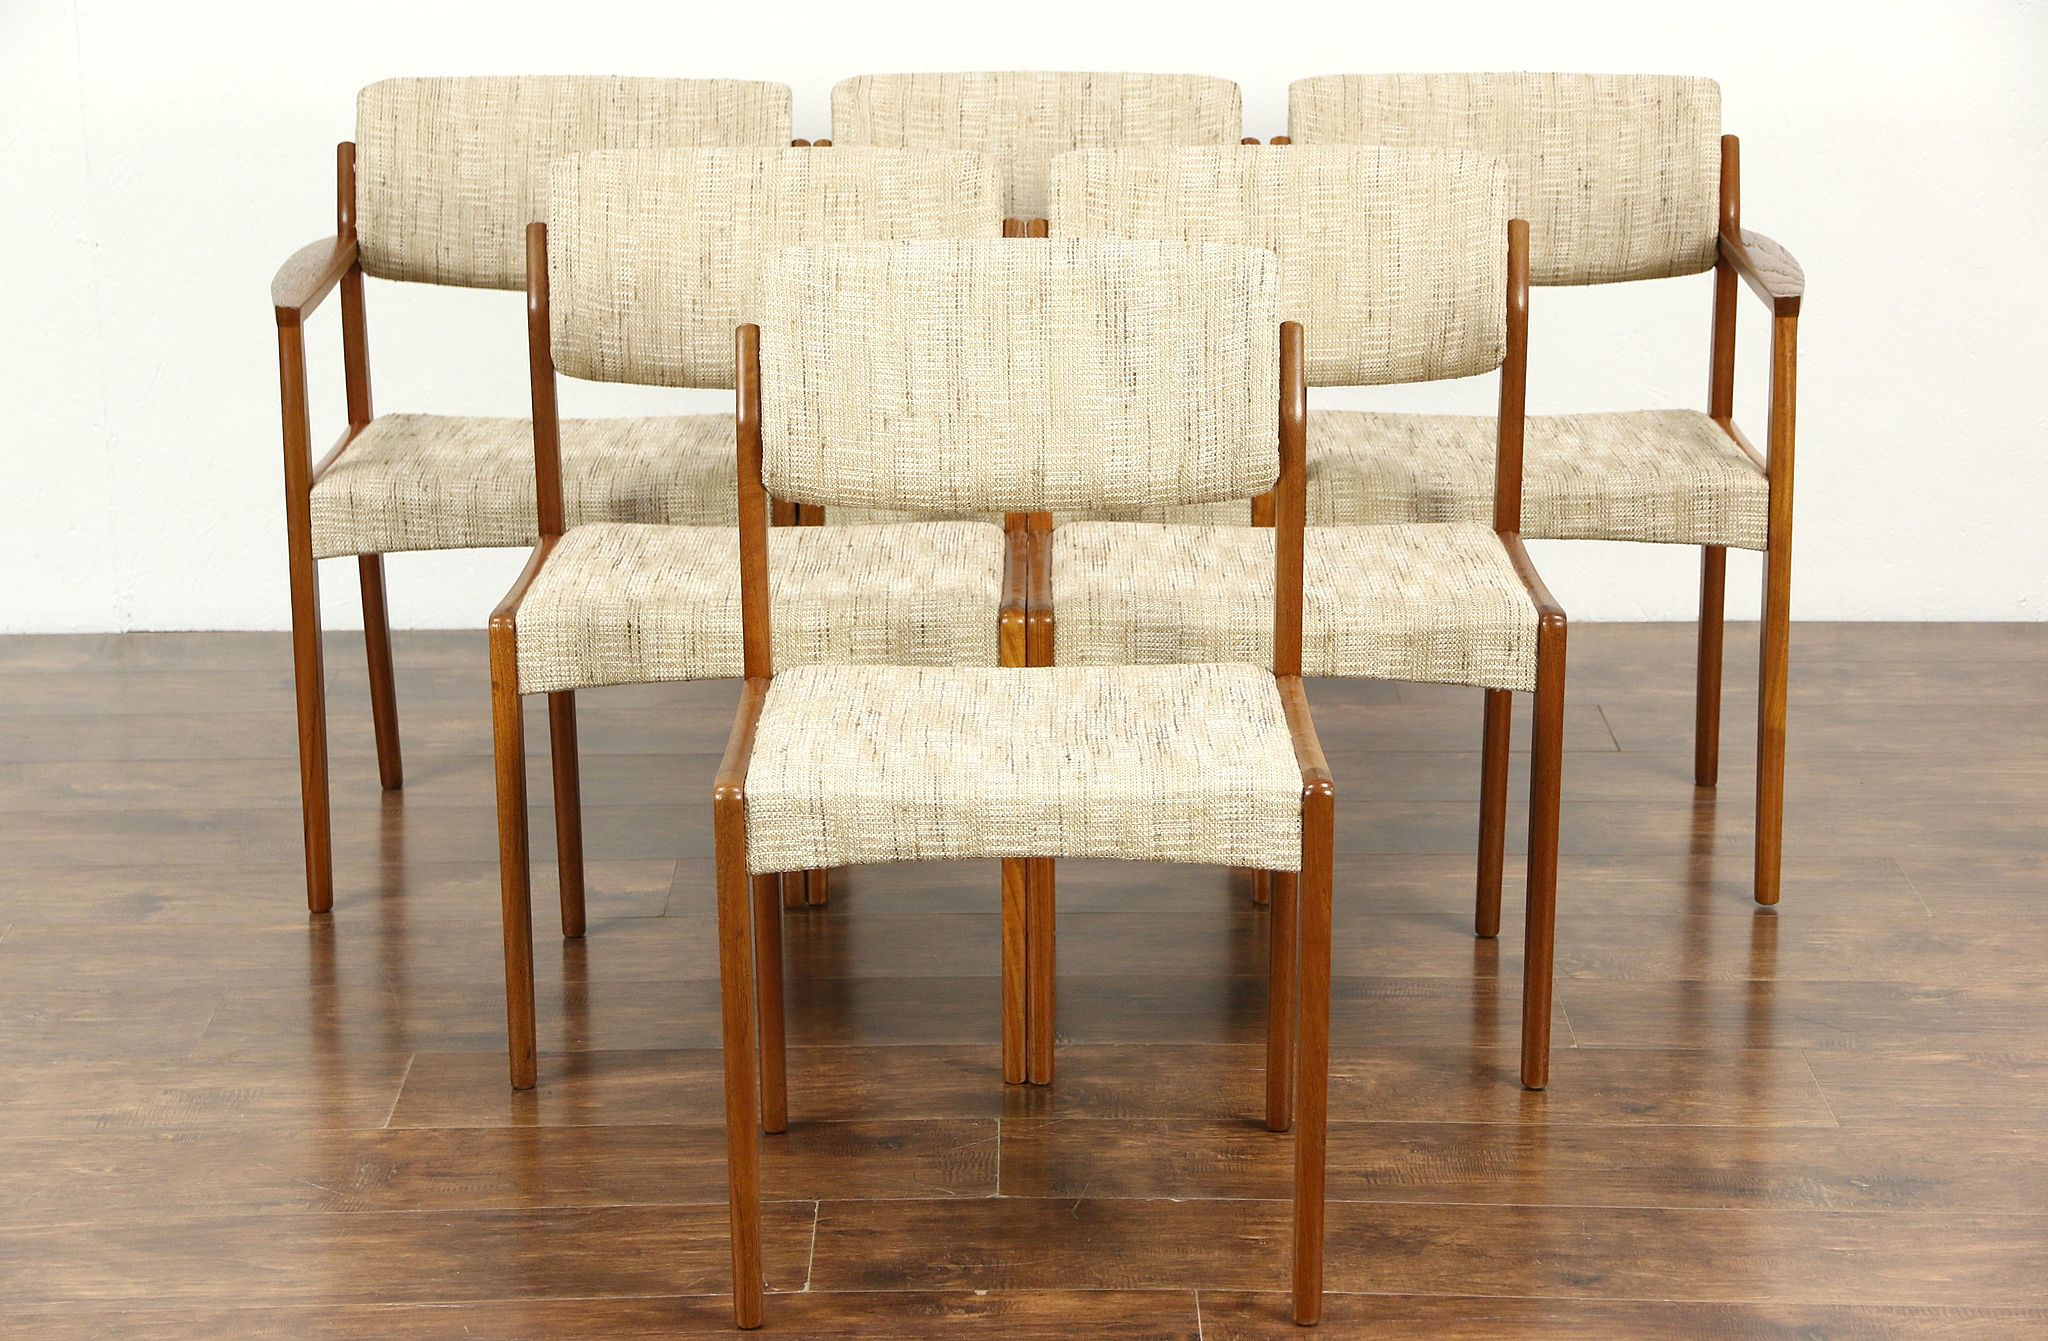 Sold Set Of 6 Midcentury Danish Modern Teak Dining Chairs Signed Bramin Denmark Harp Gallery Antiques Furniture